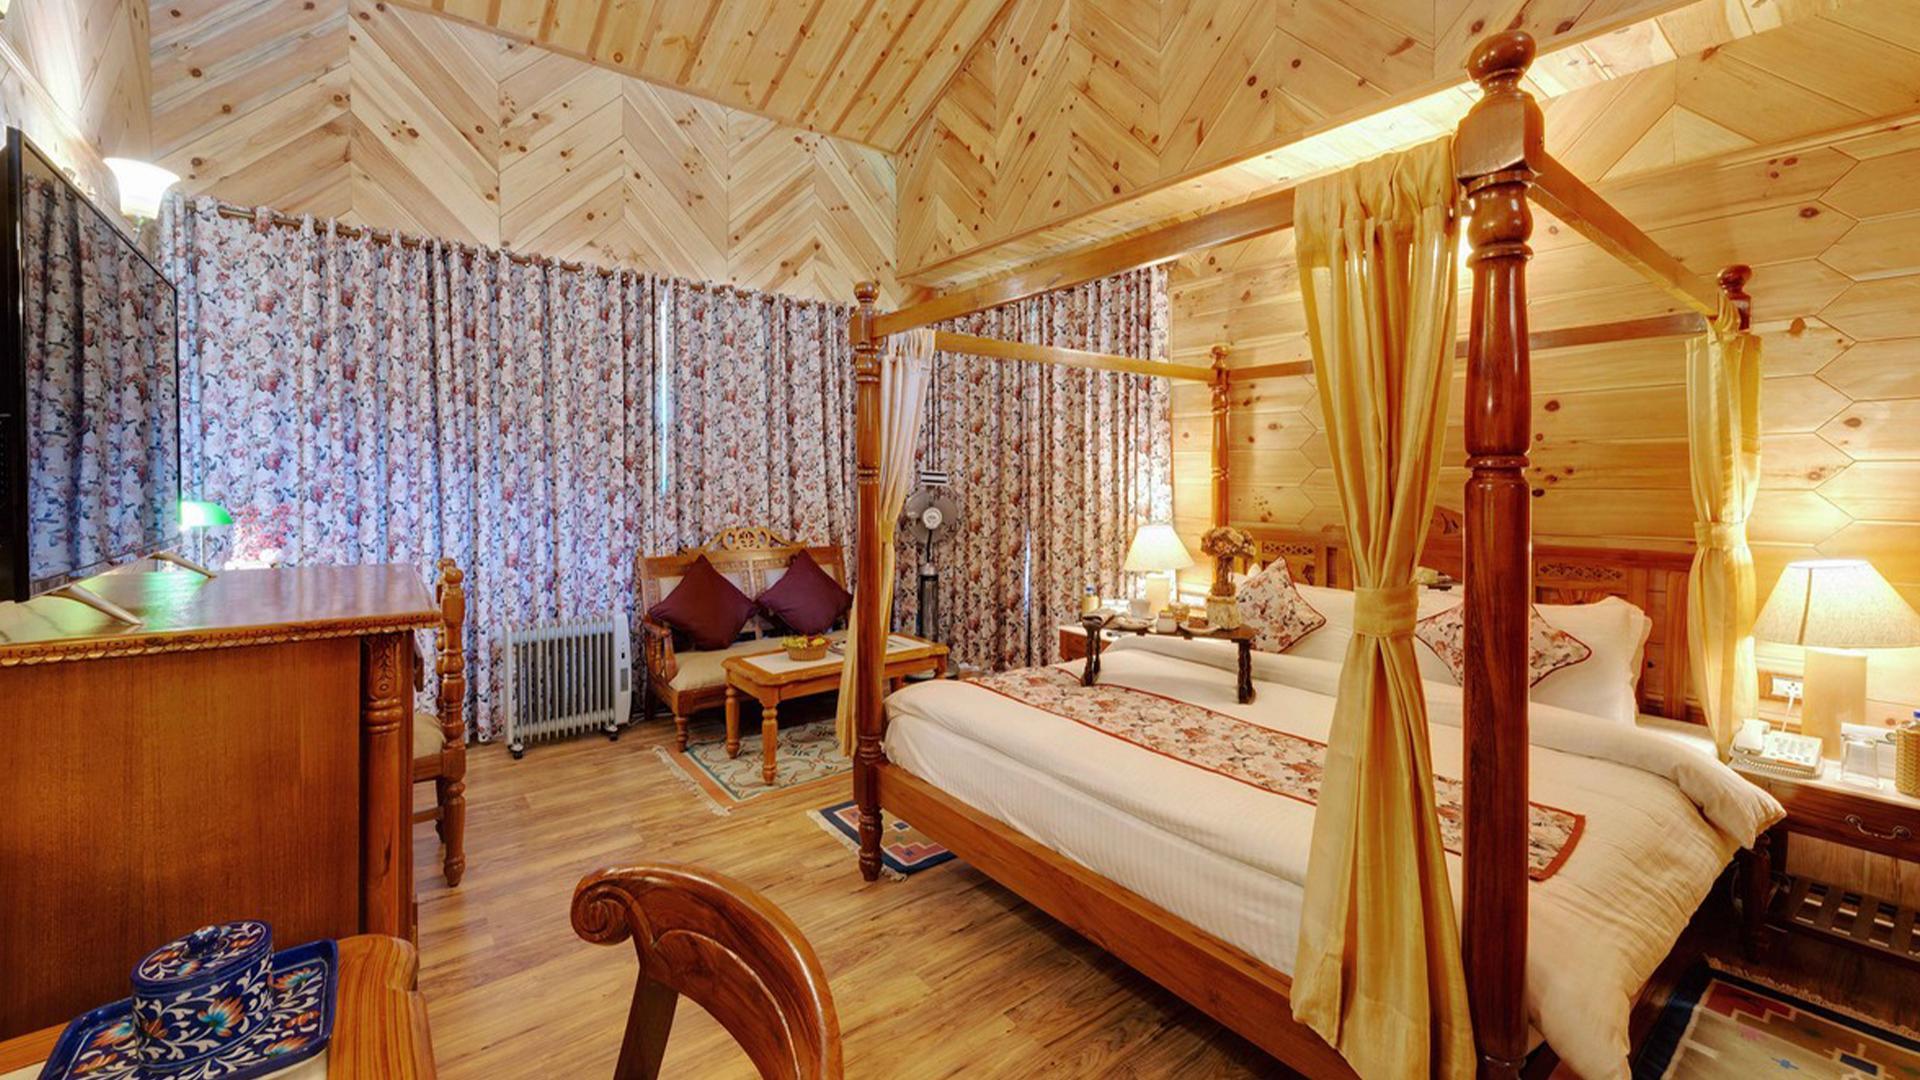 Premium Room image 1 at WelcomHeritage Urvashi's Retreat by Kullu, Himachal Pradesh, India